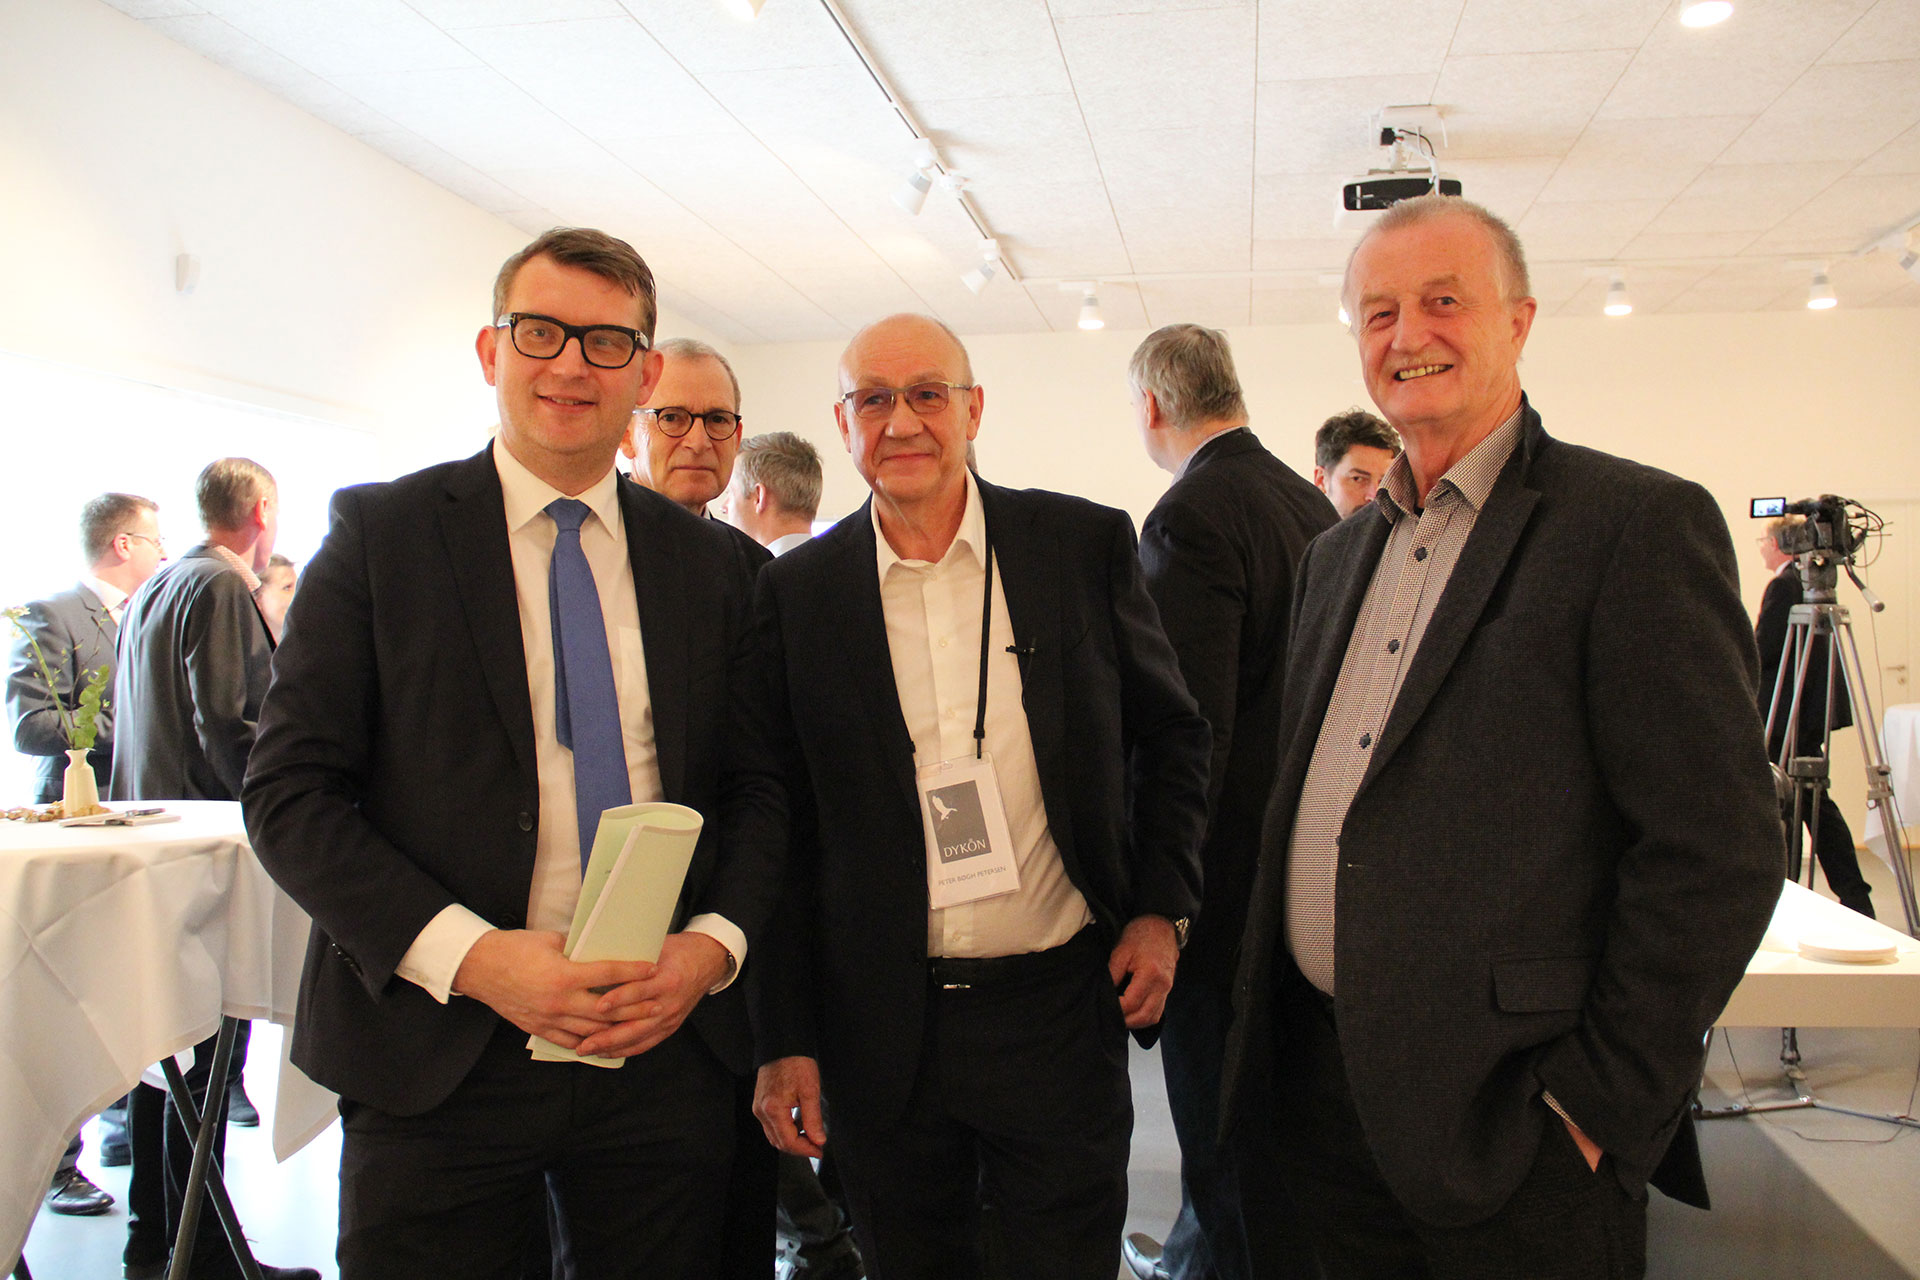 Troels Lund Poulsen, Lars Larsen og Peter Bøgh Petersen